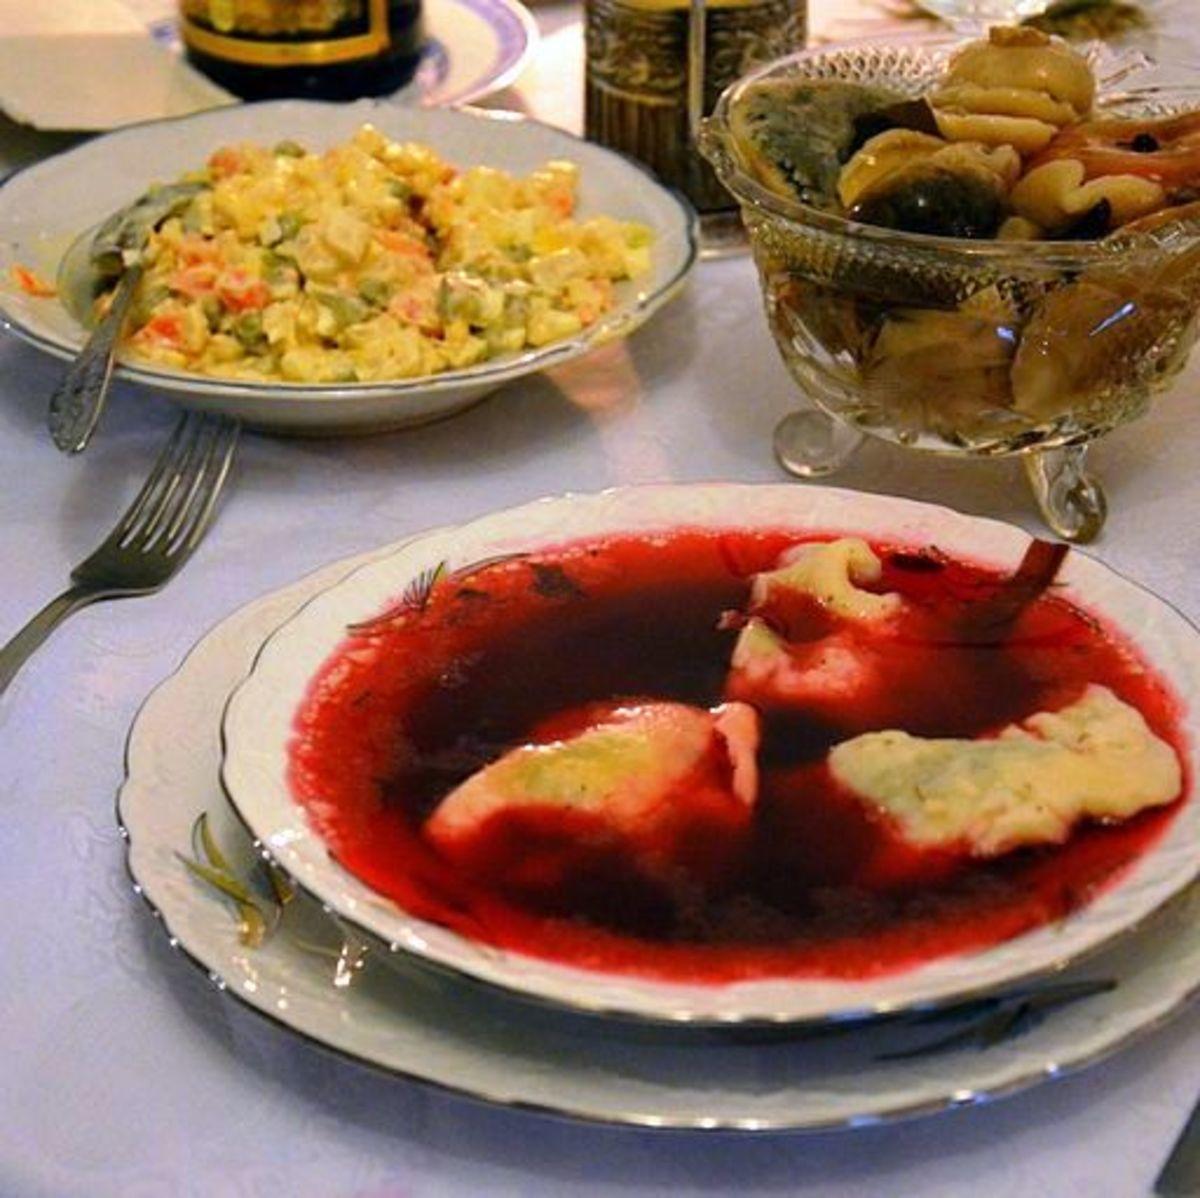 Borscht With Dumplings: The subtle flavor of dumplings enhances the taste and adds texture to a flavorful soup.